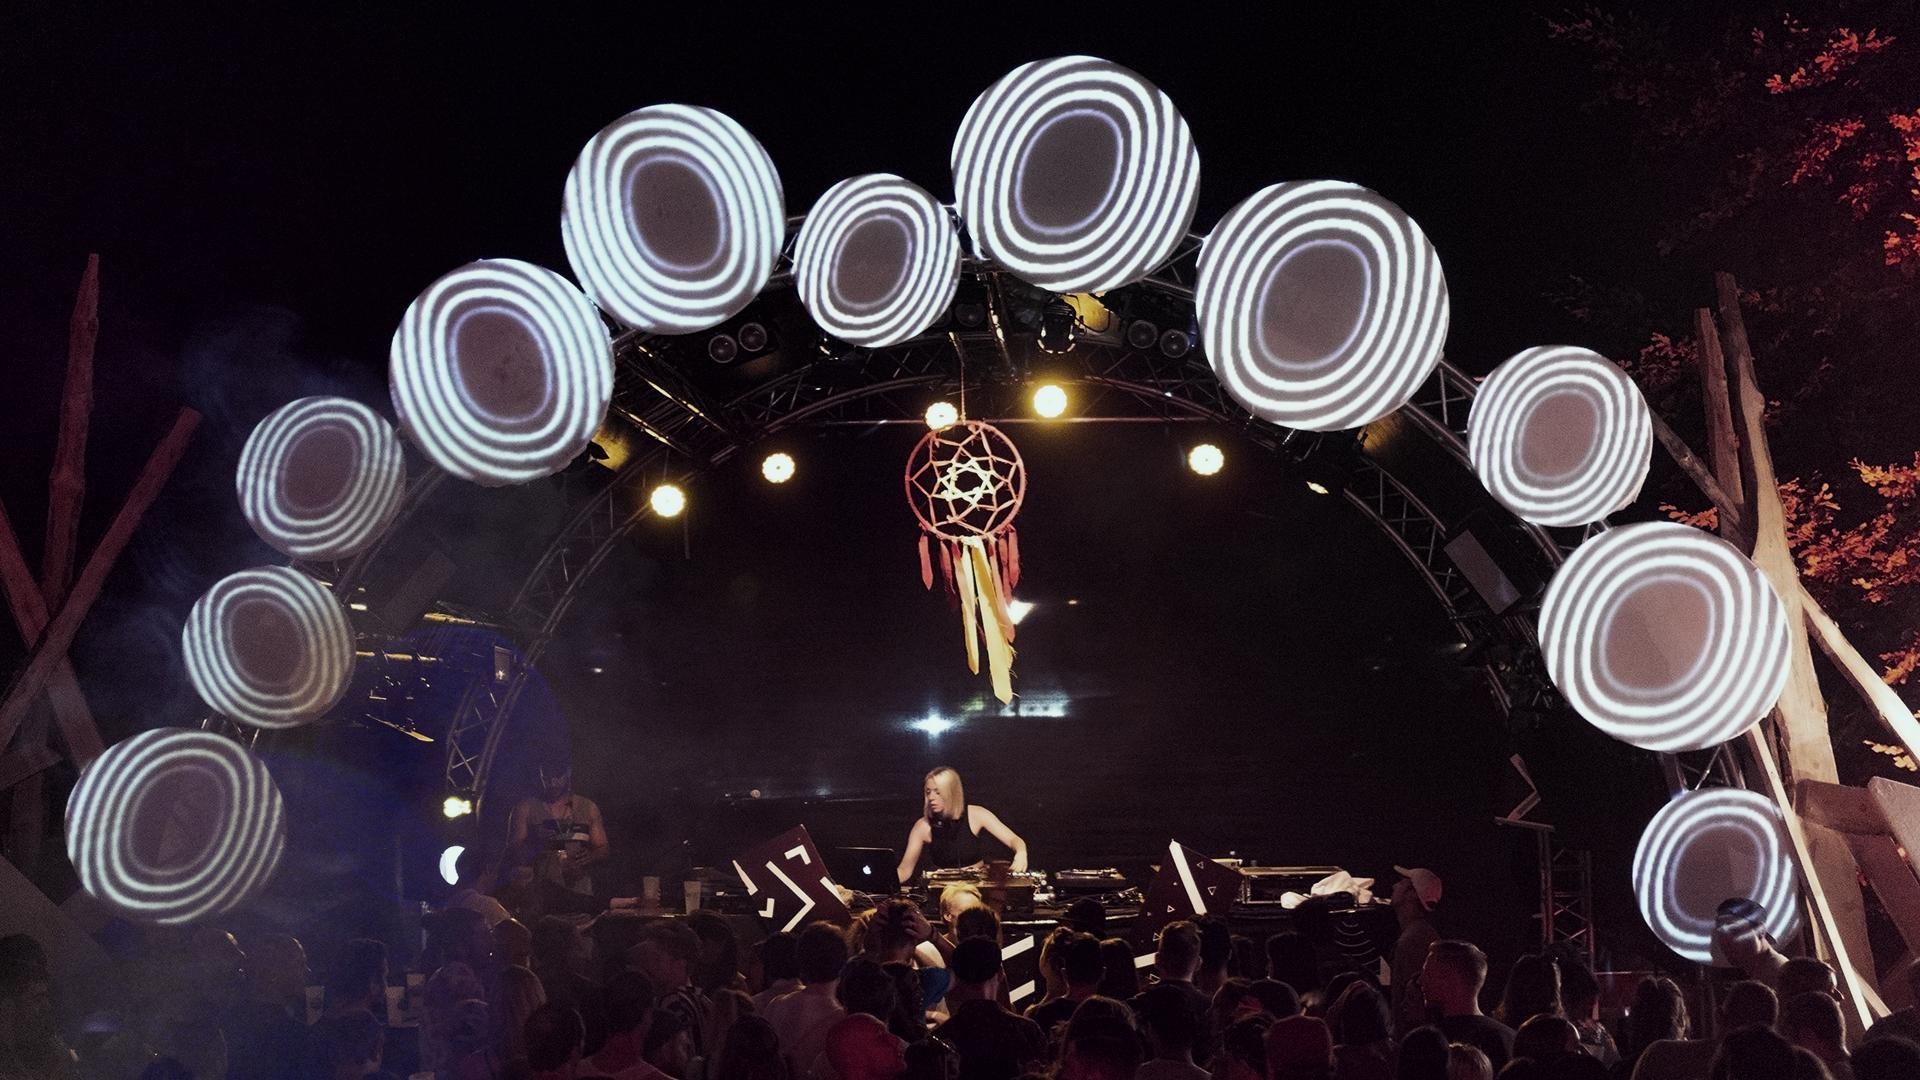 Taktraumfestival Bühne 2018 Projektionen